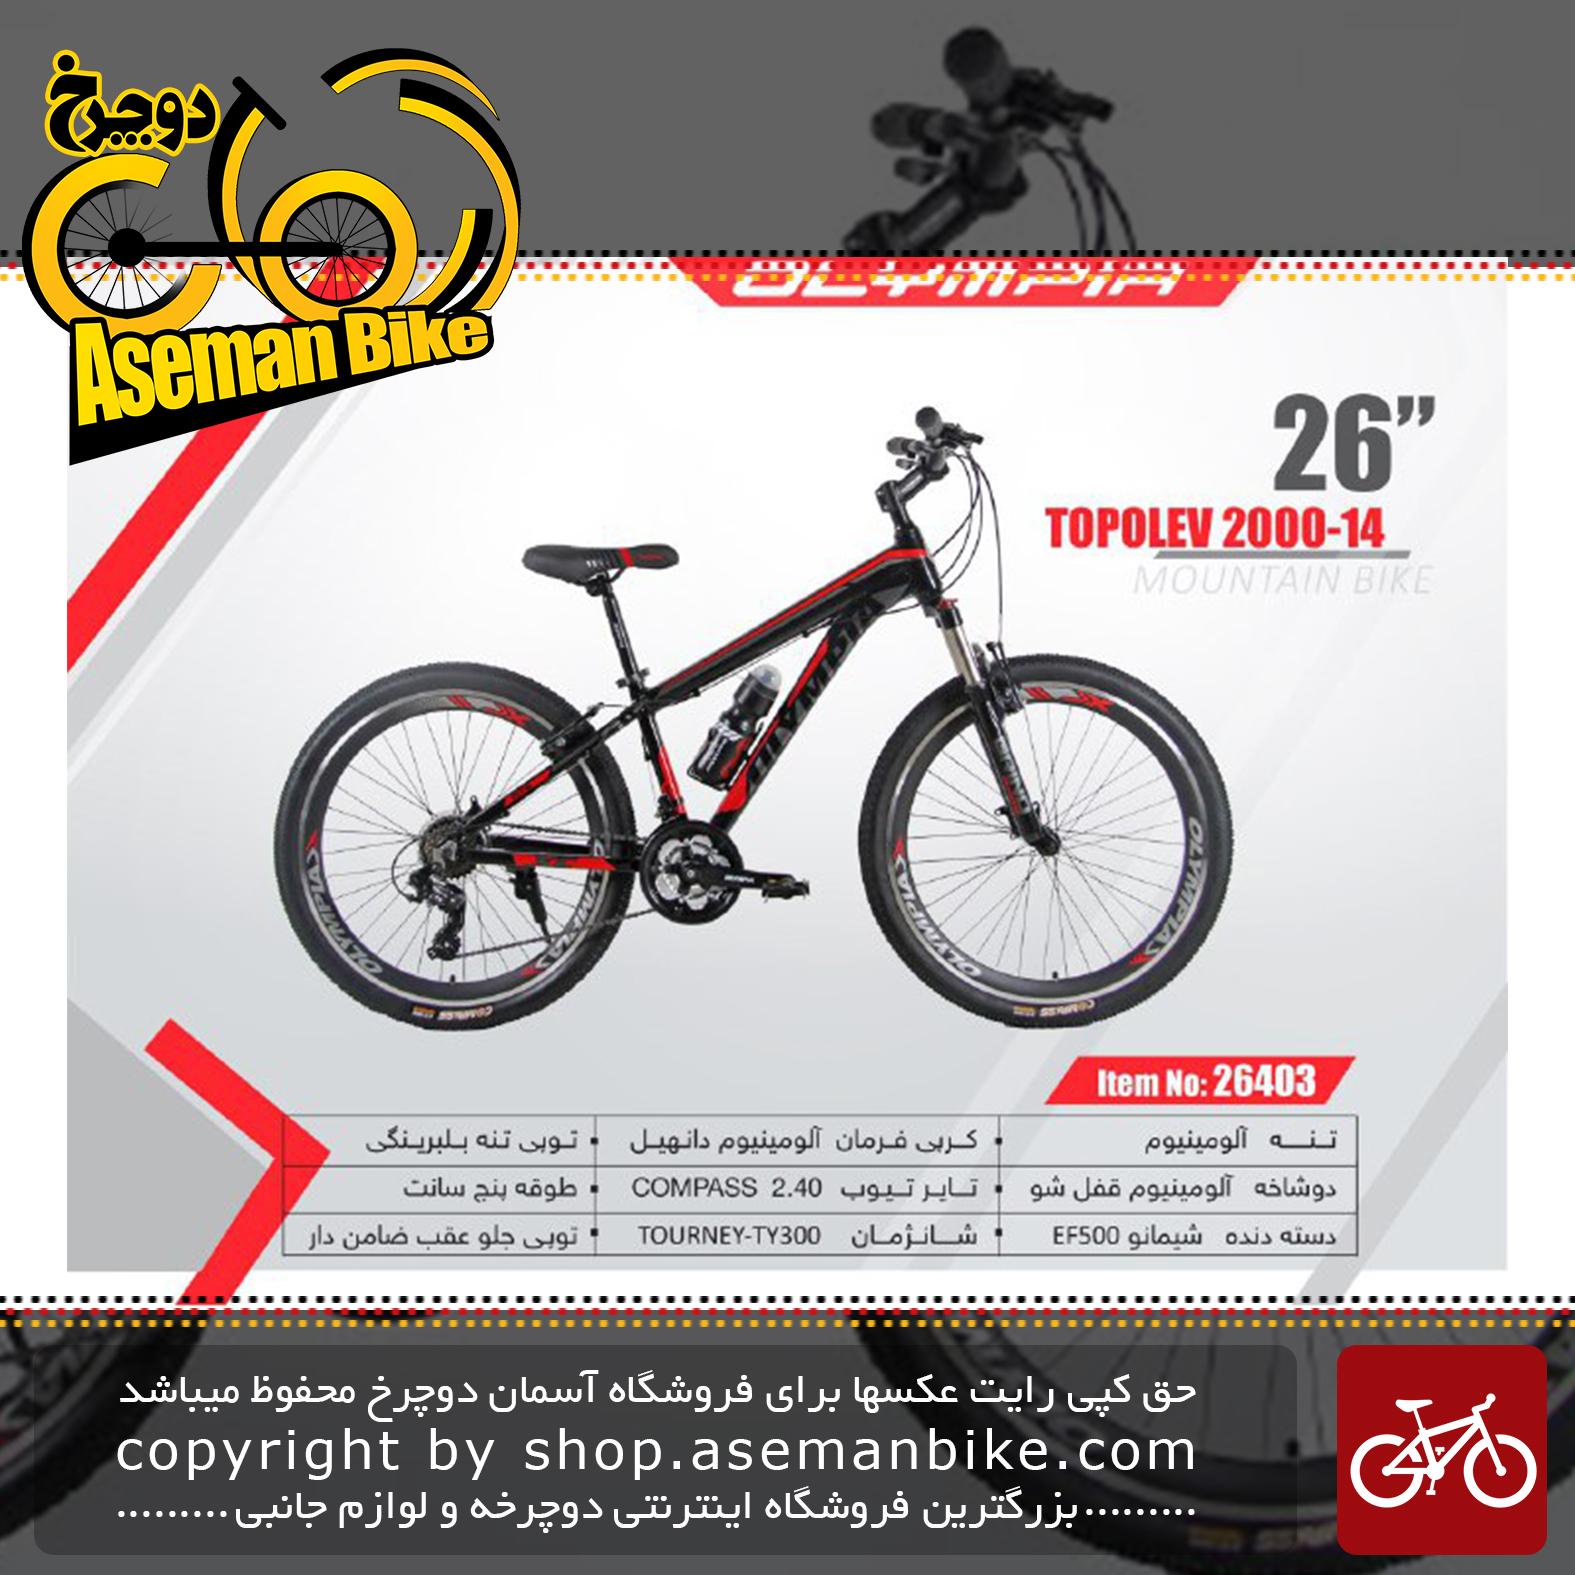 دوچرخه کوهستان المپیا سایز 26 مدل تاپالو OLYMPIA SIZE 26 TOPOLEV2000 14 2000 14